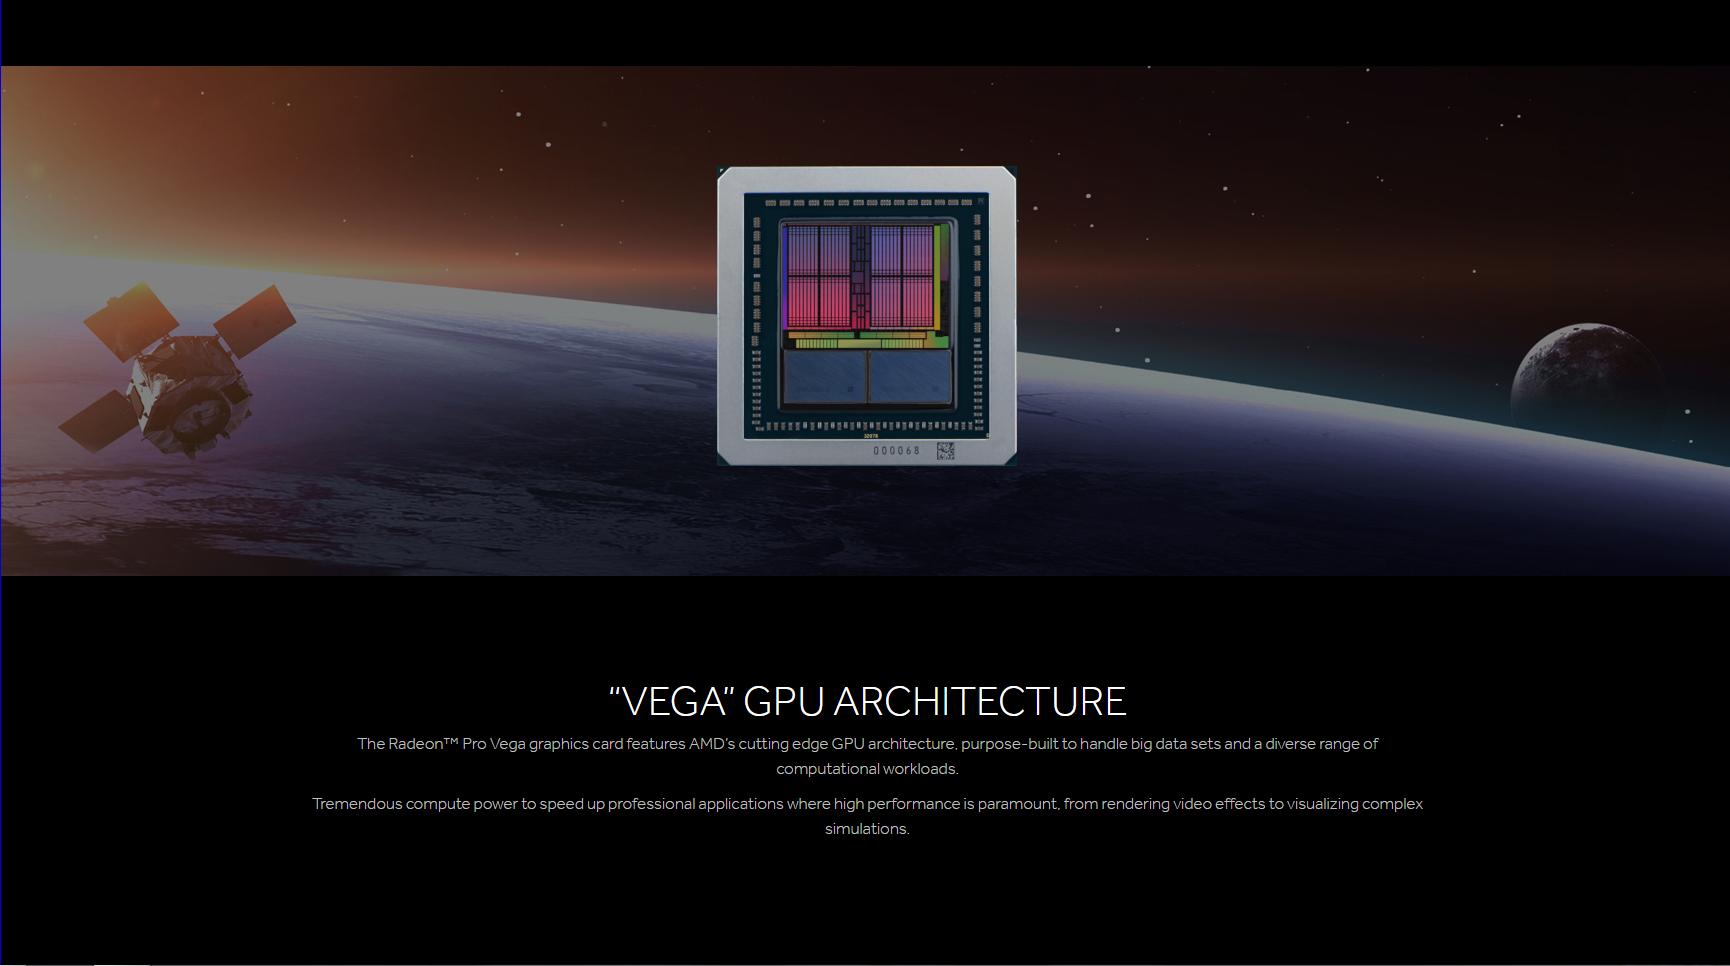 AMD Debuts Radeon Pro Vega 64 & Vega 56 - 25-22 TFLOPS